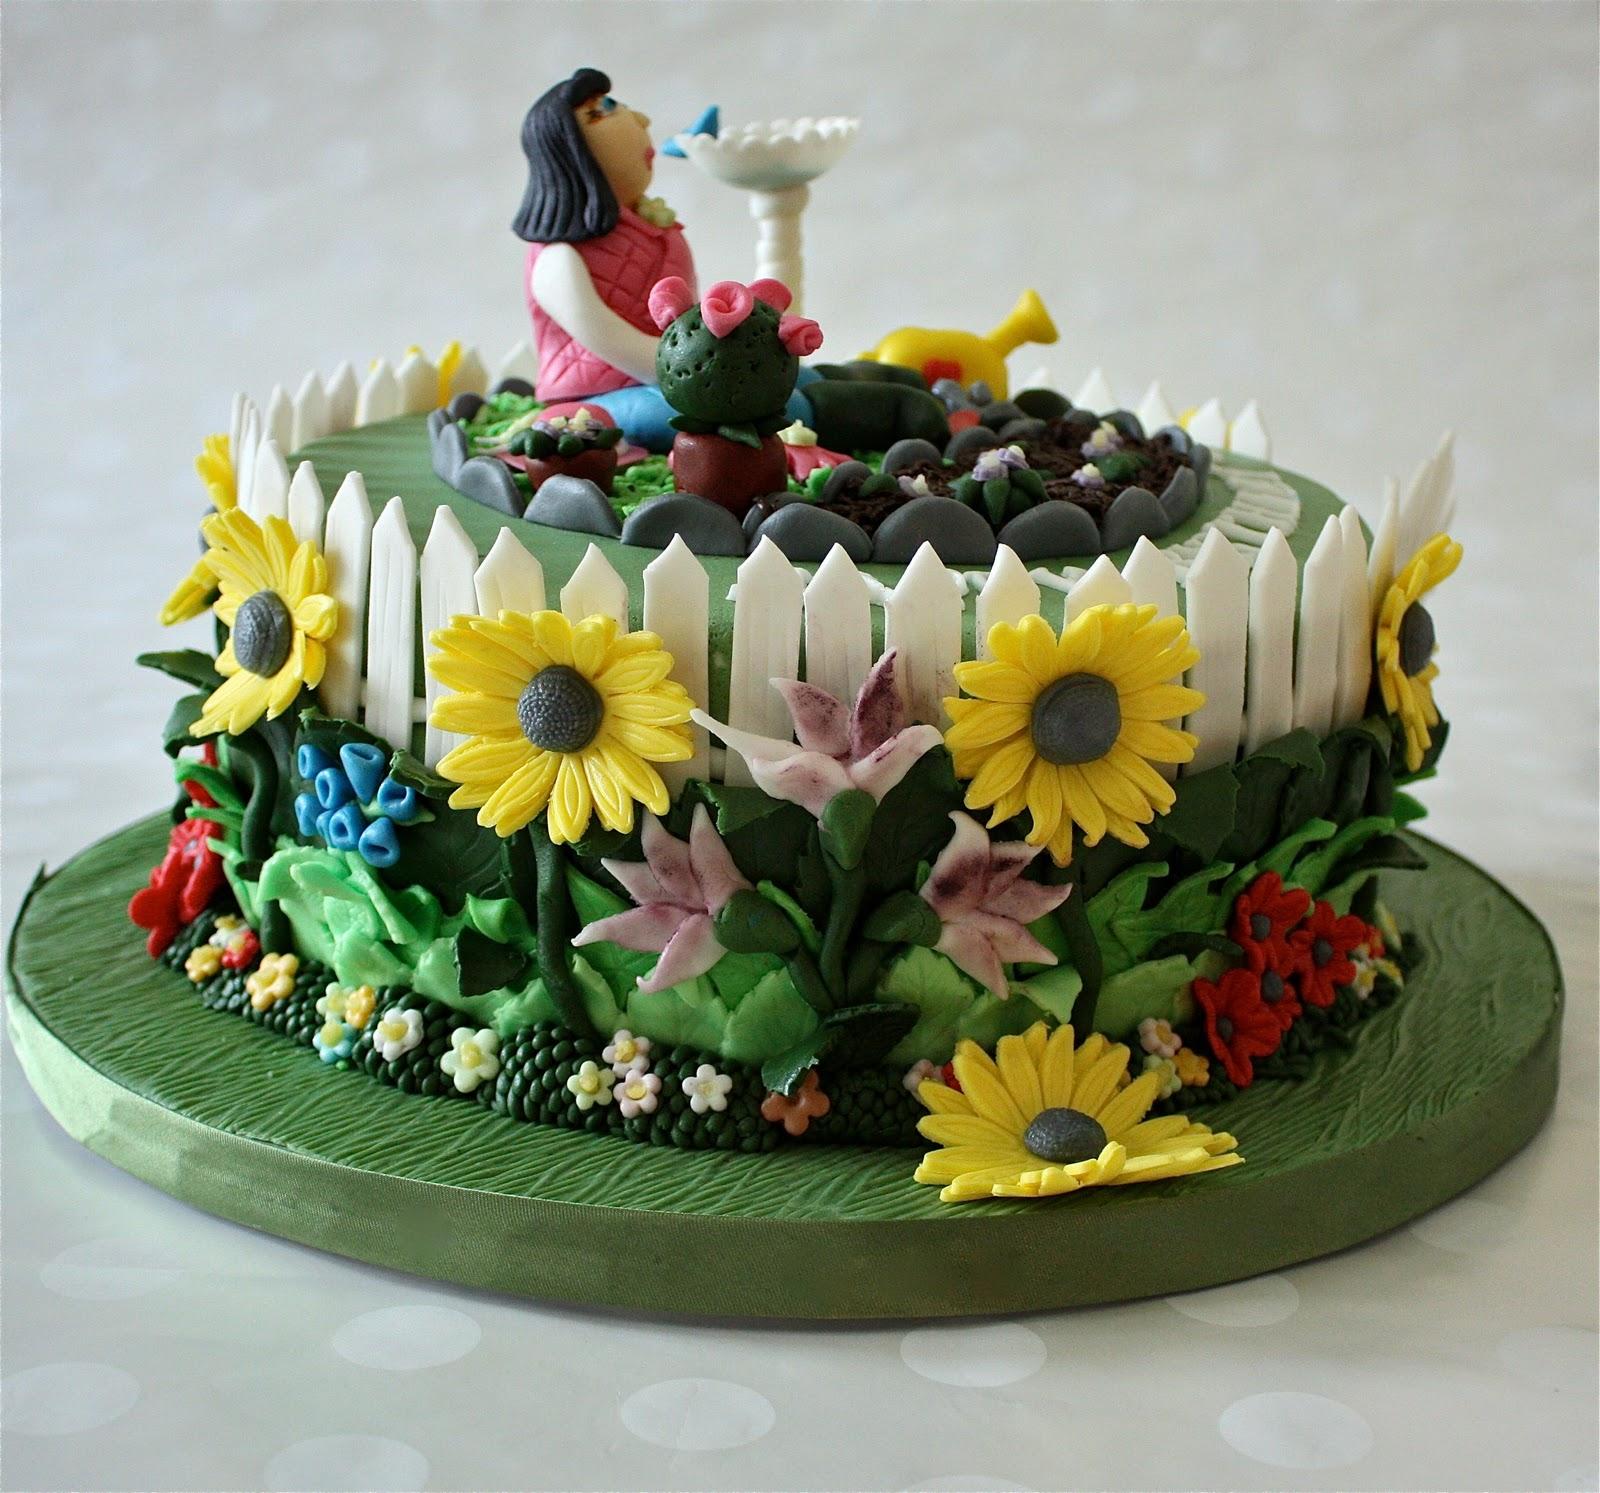 gardening cake - Garden Design Birthday Cake